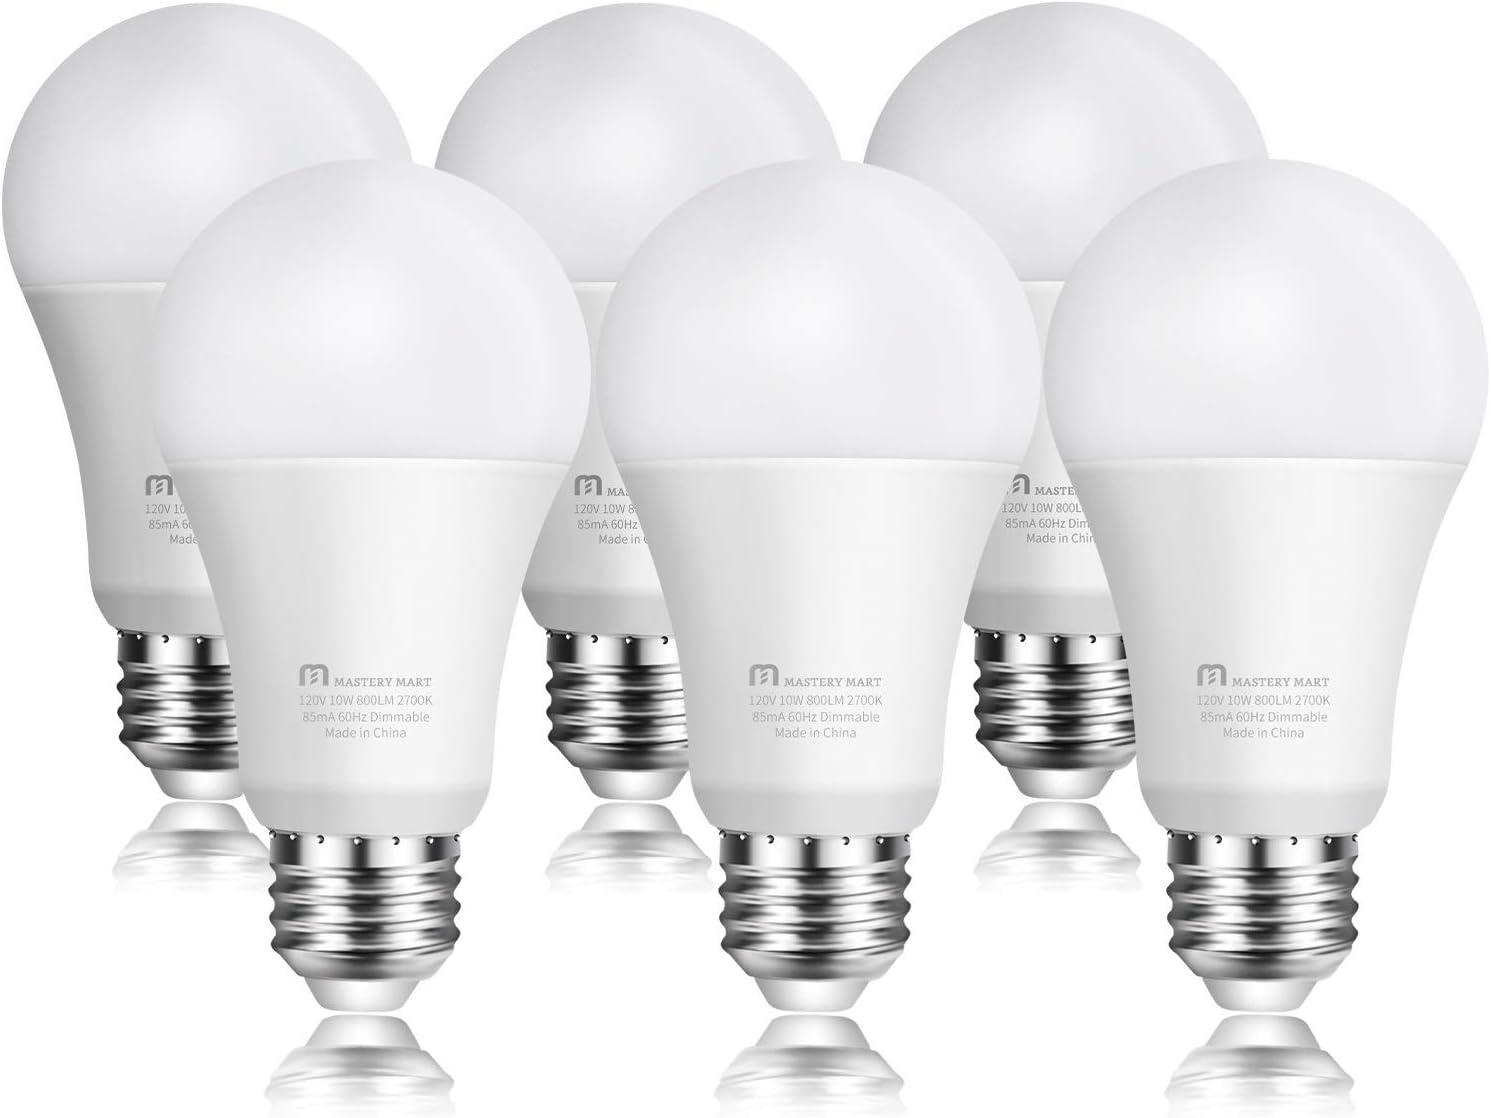 1-pk FireFly A19 10W Dimmable 60W LED Light Bulb 2700K Warm White E26 800 Lumens